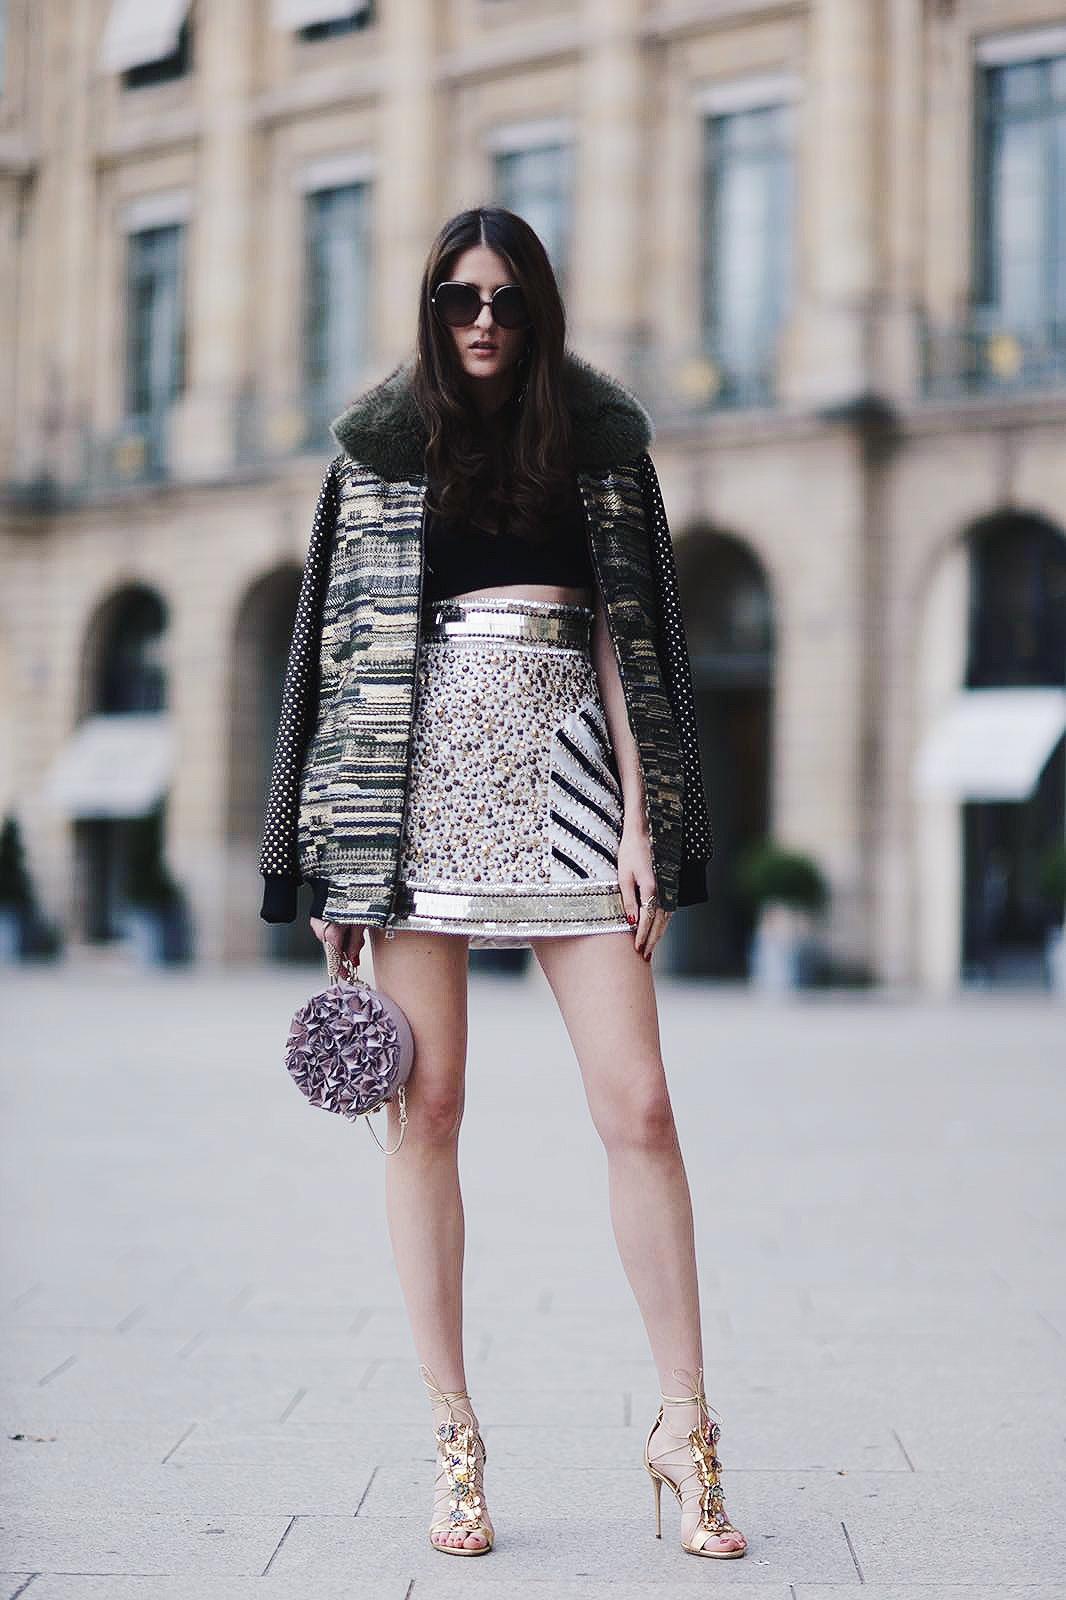 Jennifer Selmanovic | Des & Jen |Paris Fashion Week |Haute Couture